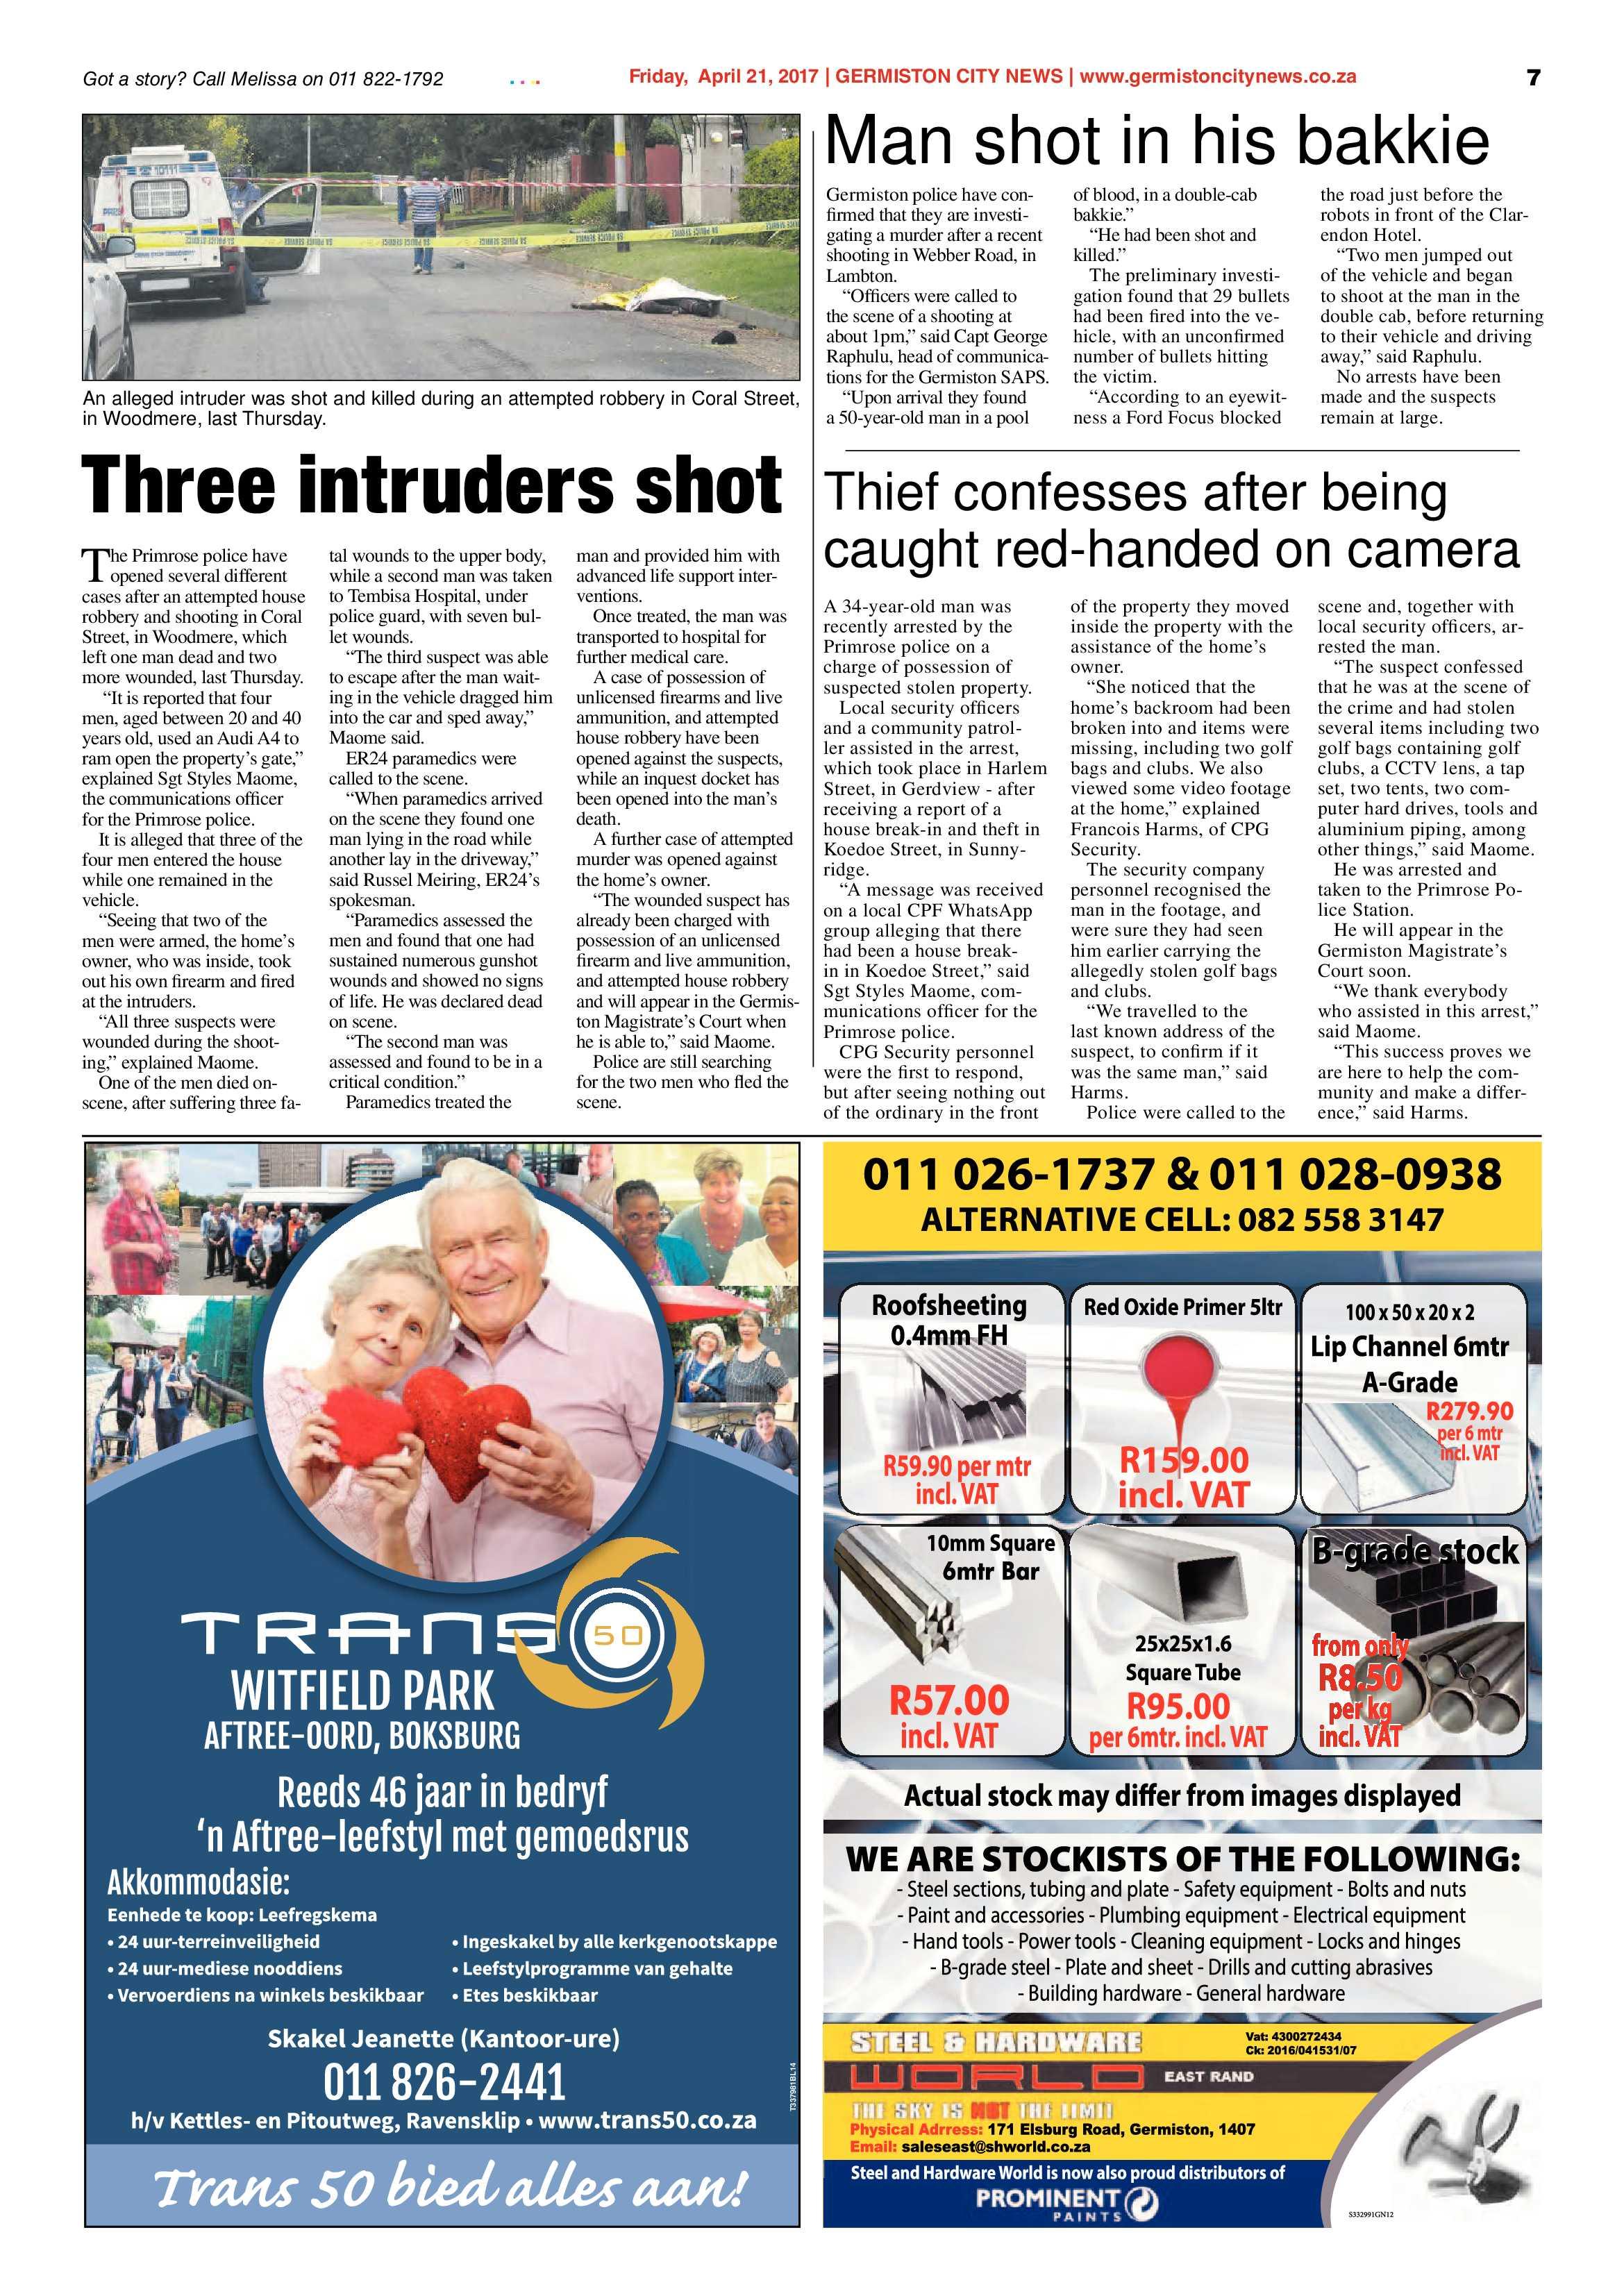 germiston-city-news-19-april-2017-epapers-page-7